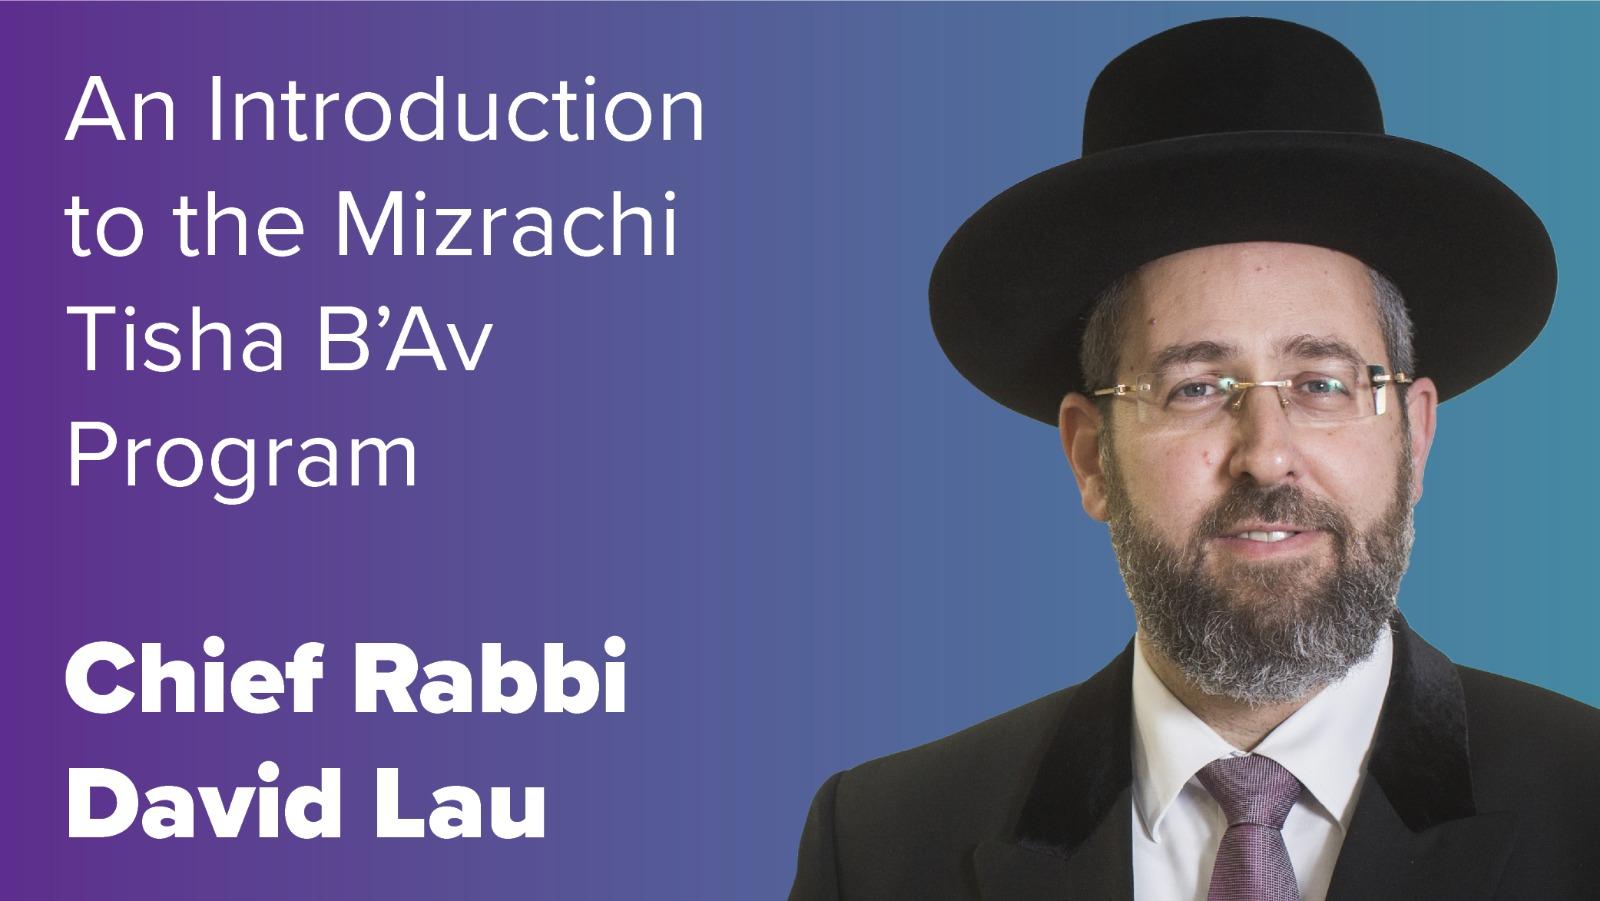 An Introduction to the Mizrachi Tisha B'Av Program